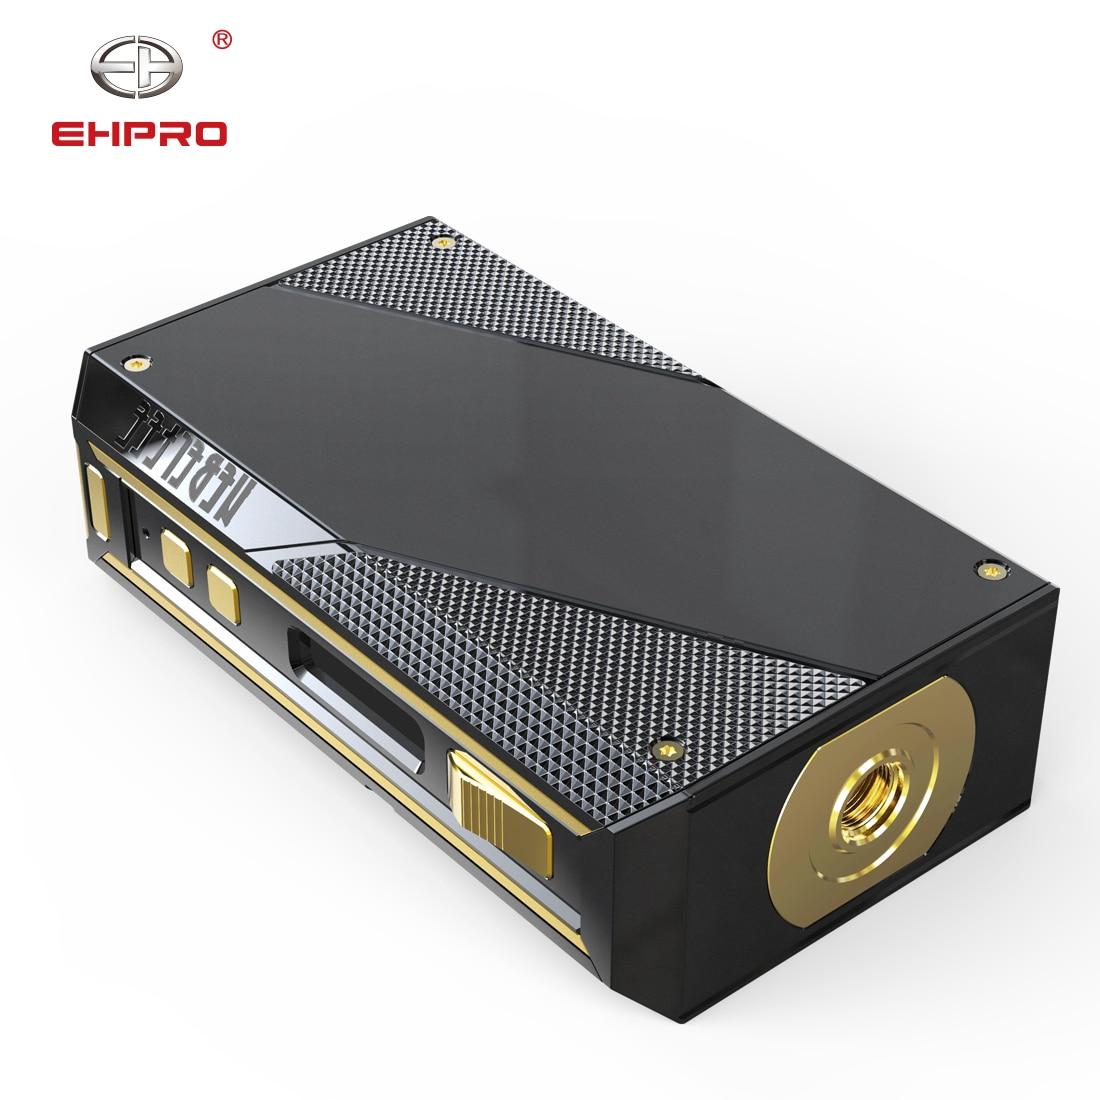 Подарок Vape мод Ehpro холодная сталь 200 TC мод 200 Вт электронная сигарета мод без батареи подходит 510 vape Танк vs dovpo topside/drag mini - 3